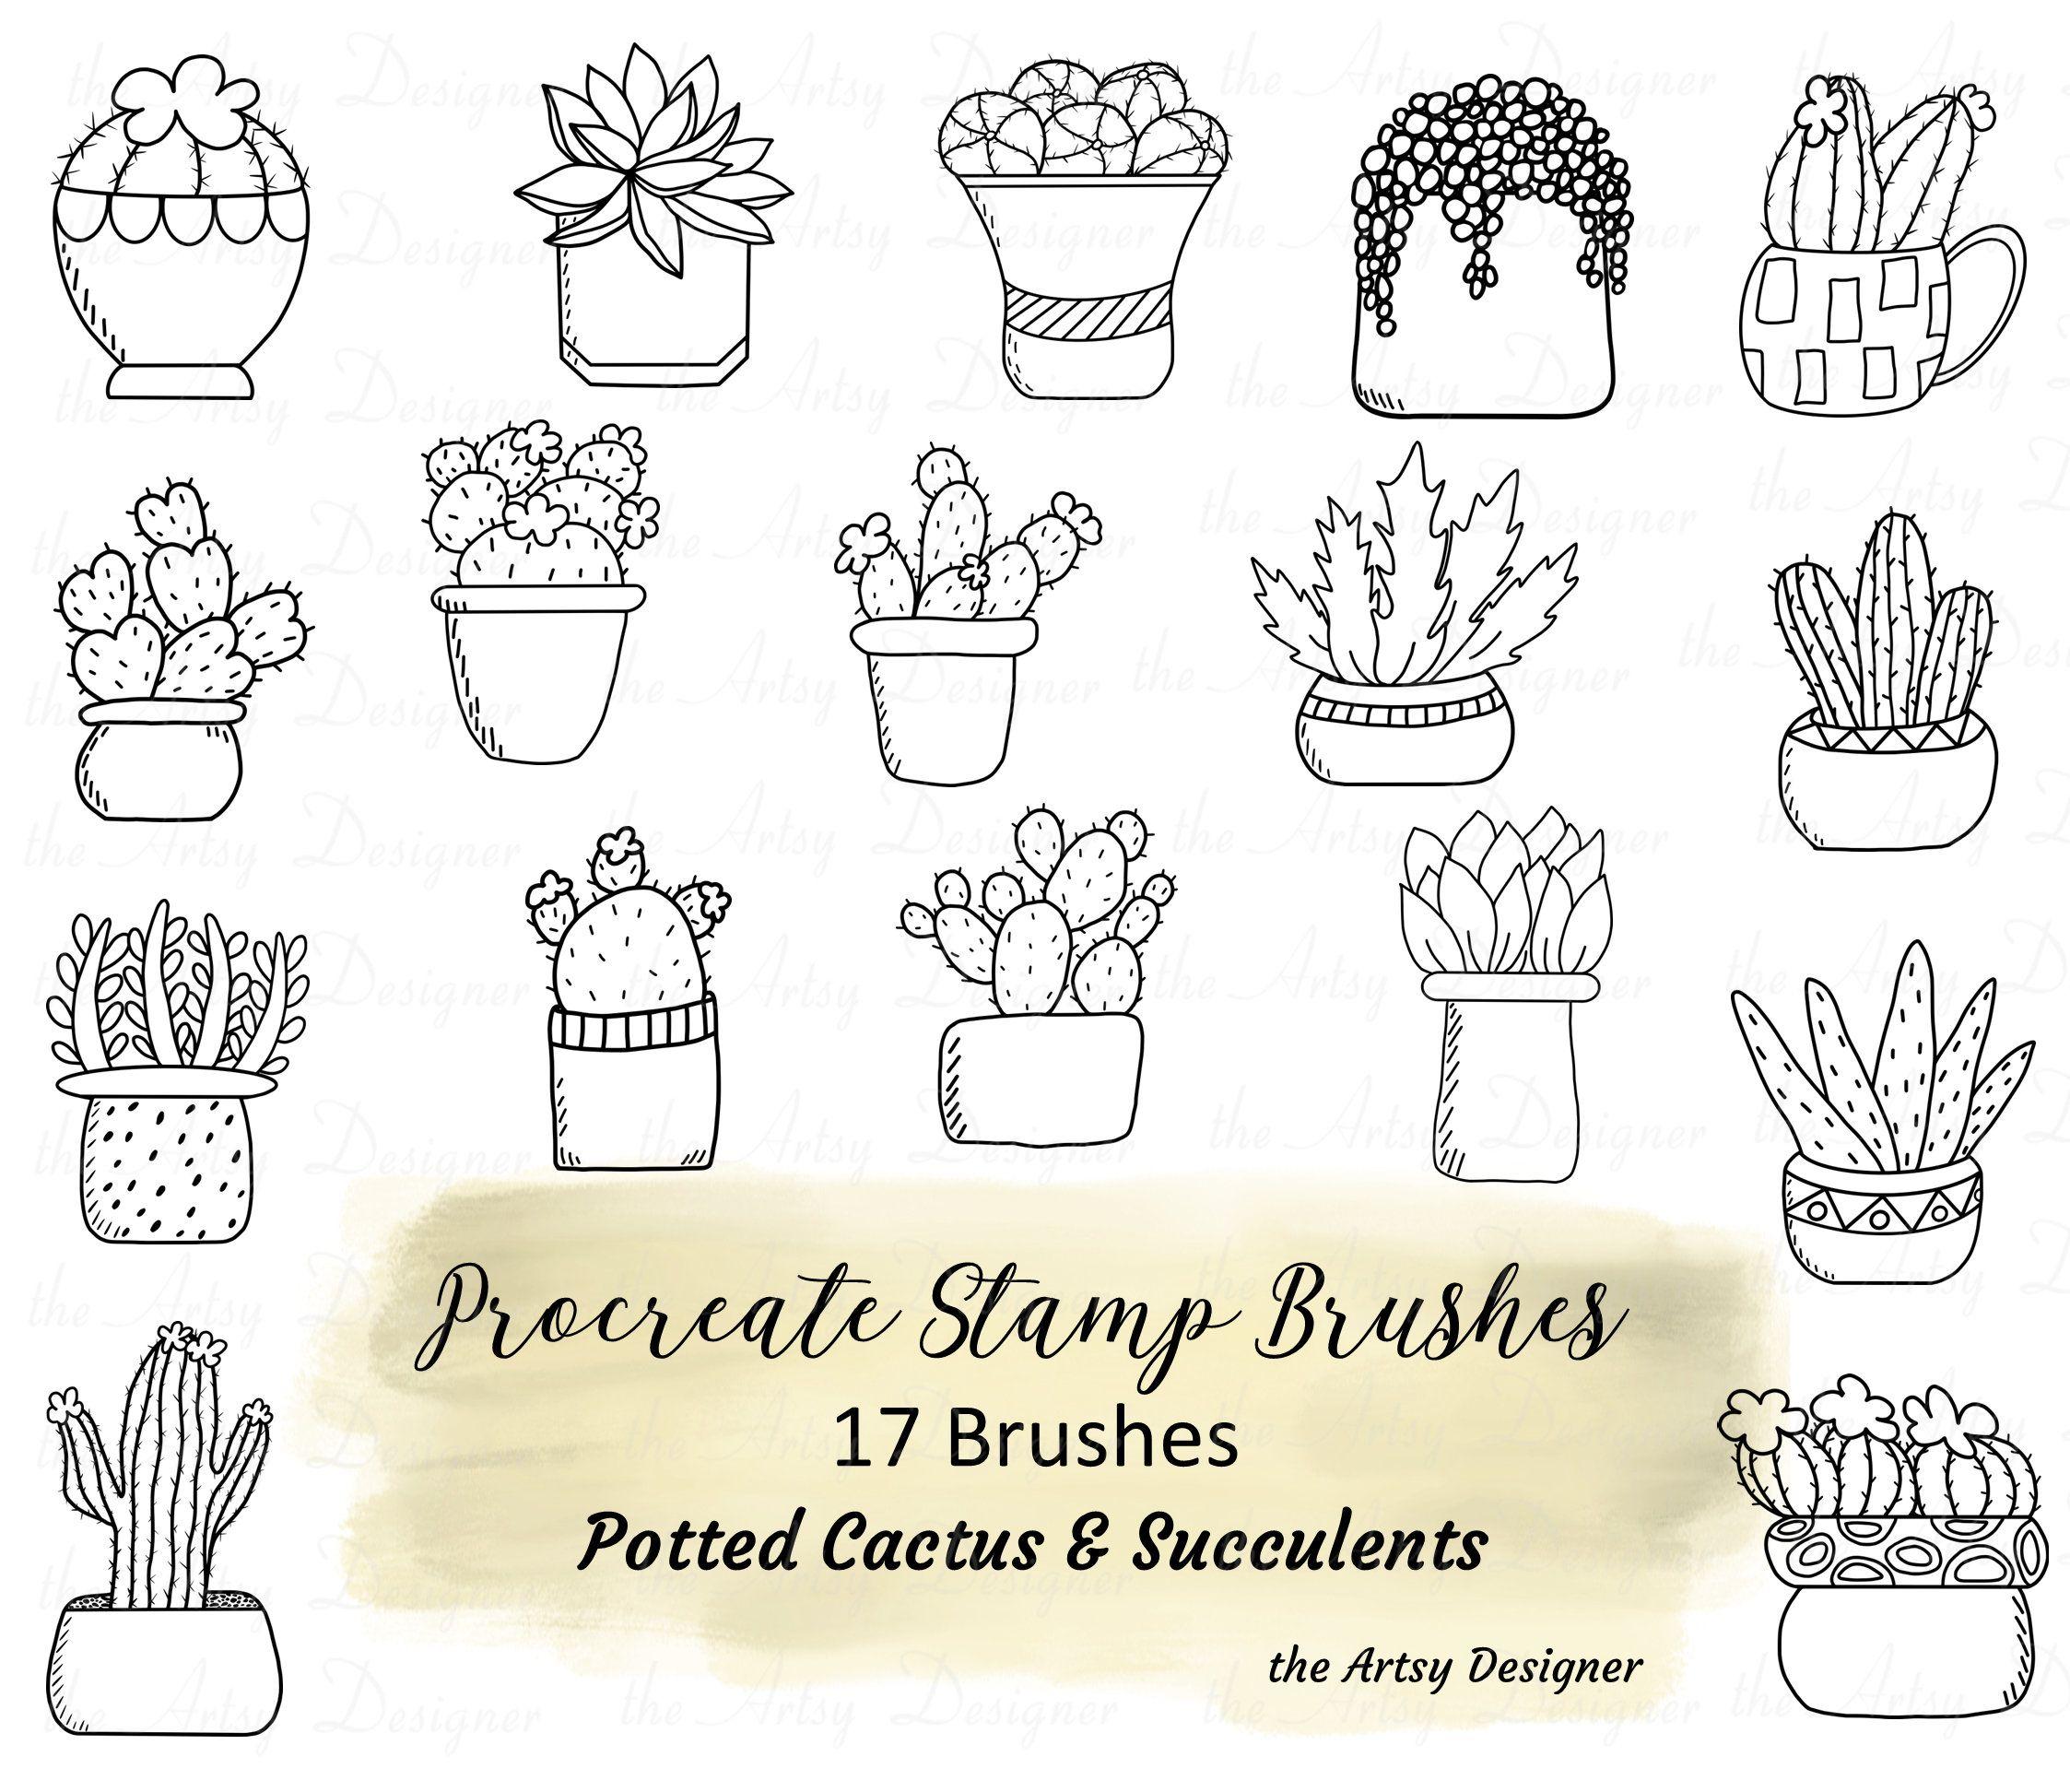 17 Procreate Brushes Bundle Cactus Succulents Lineart Brush Etsy Procreate Brushes Procreate App Procreate